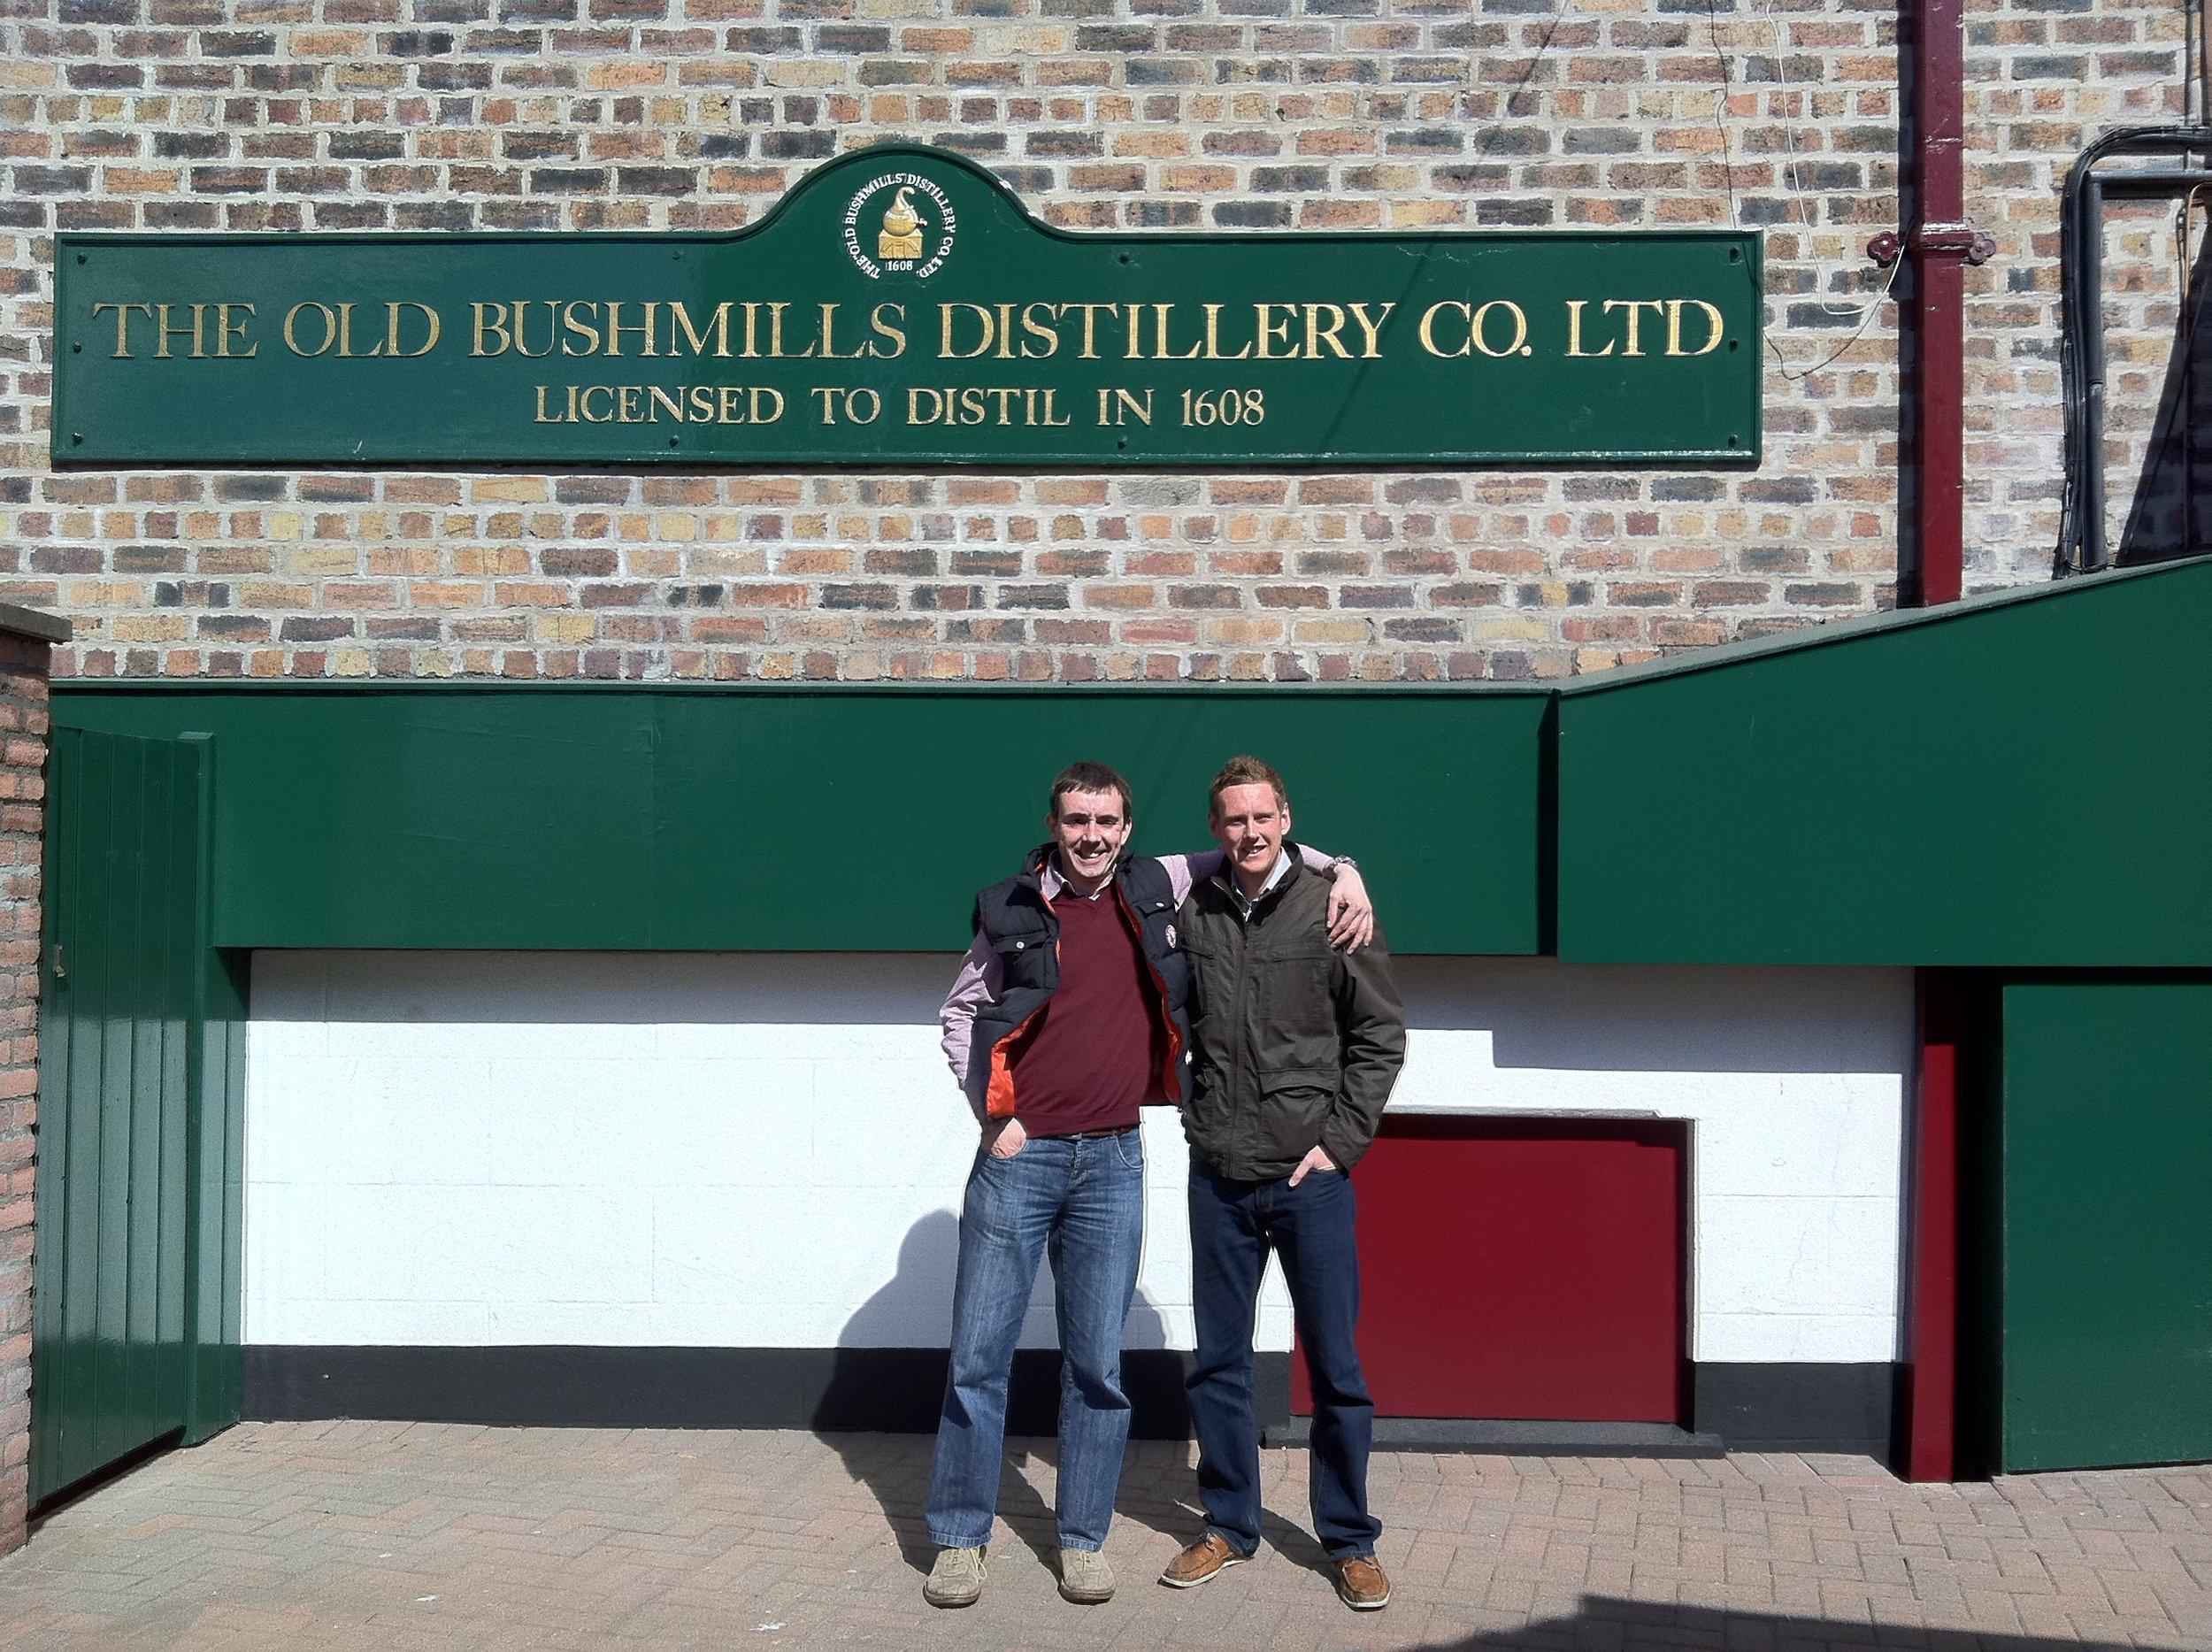 Peter Cobley and Chris Pattinson at Bushmills distillery